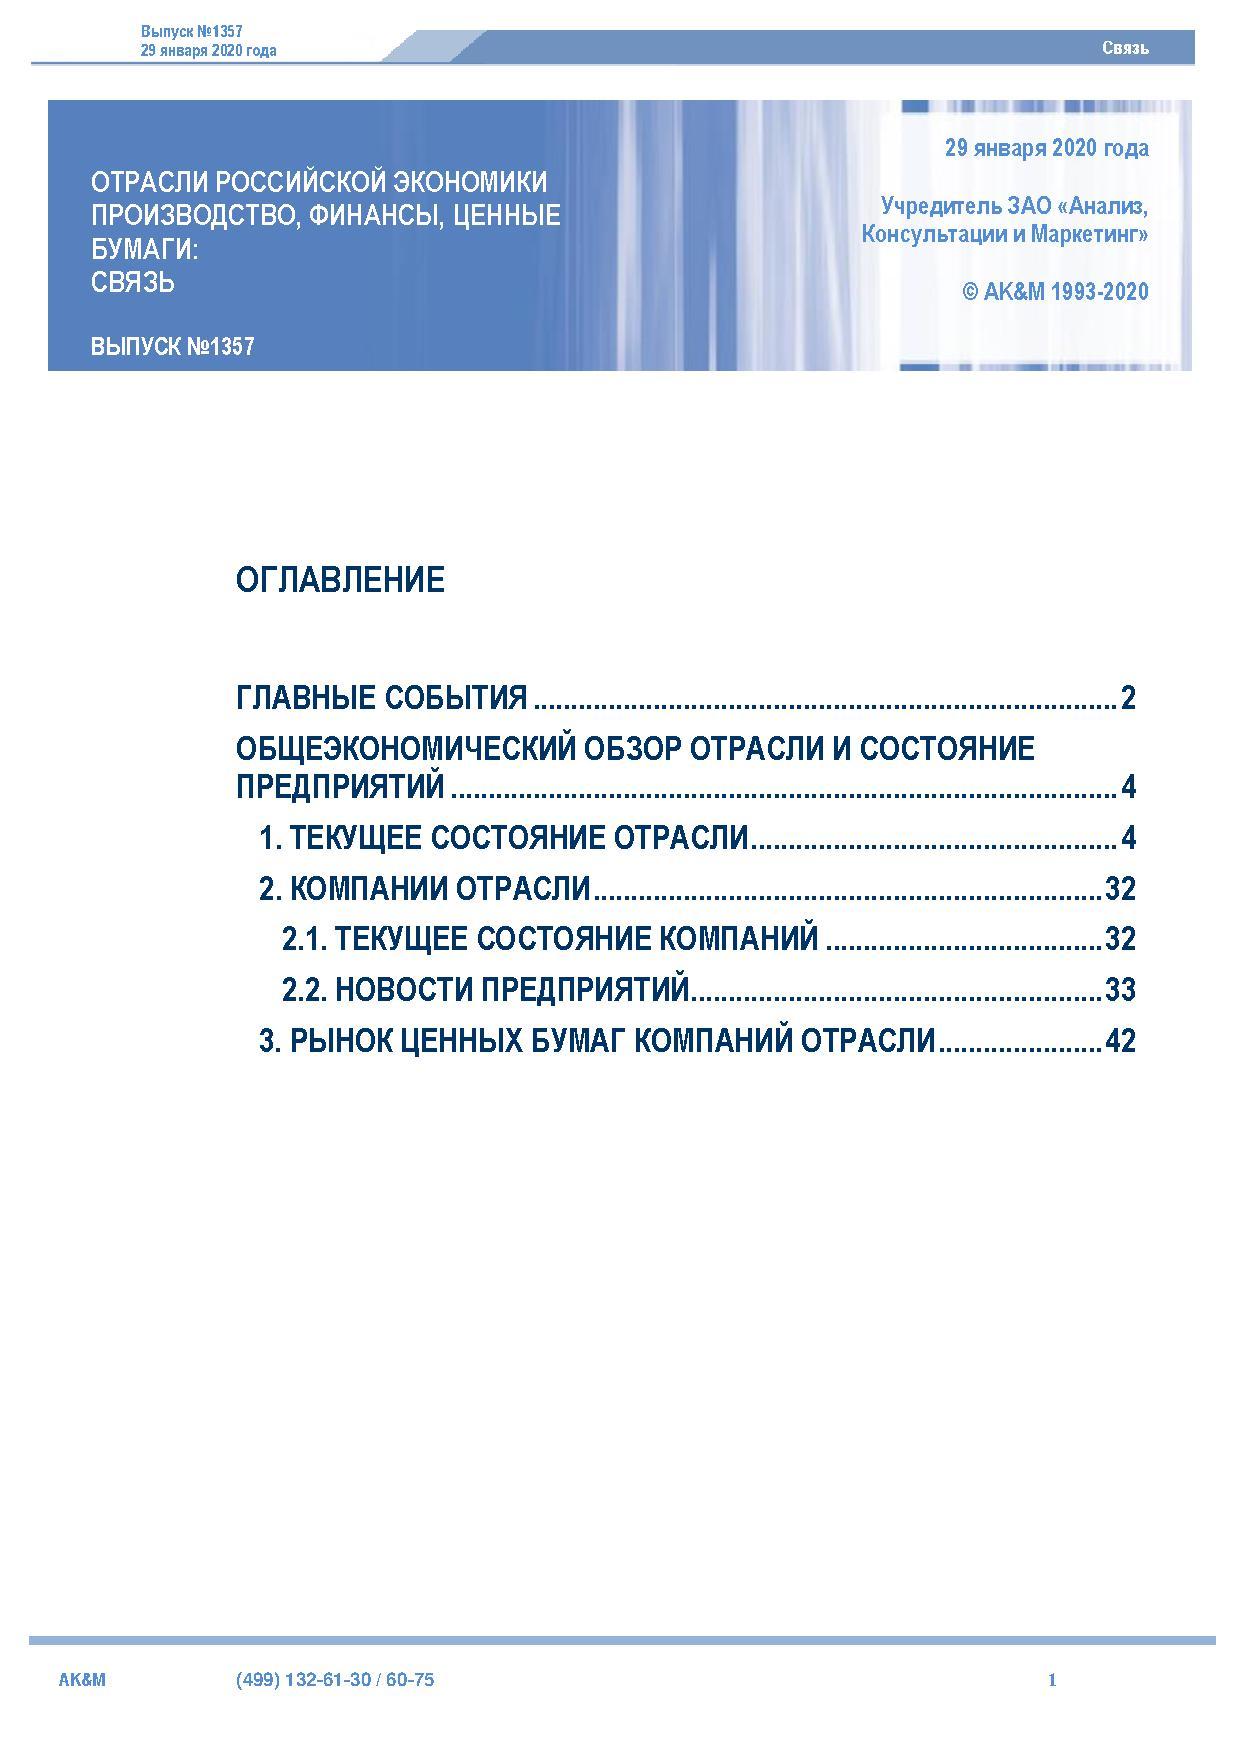 №1357 Связь